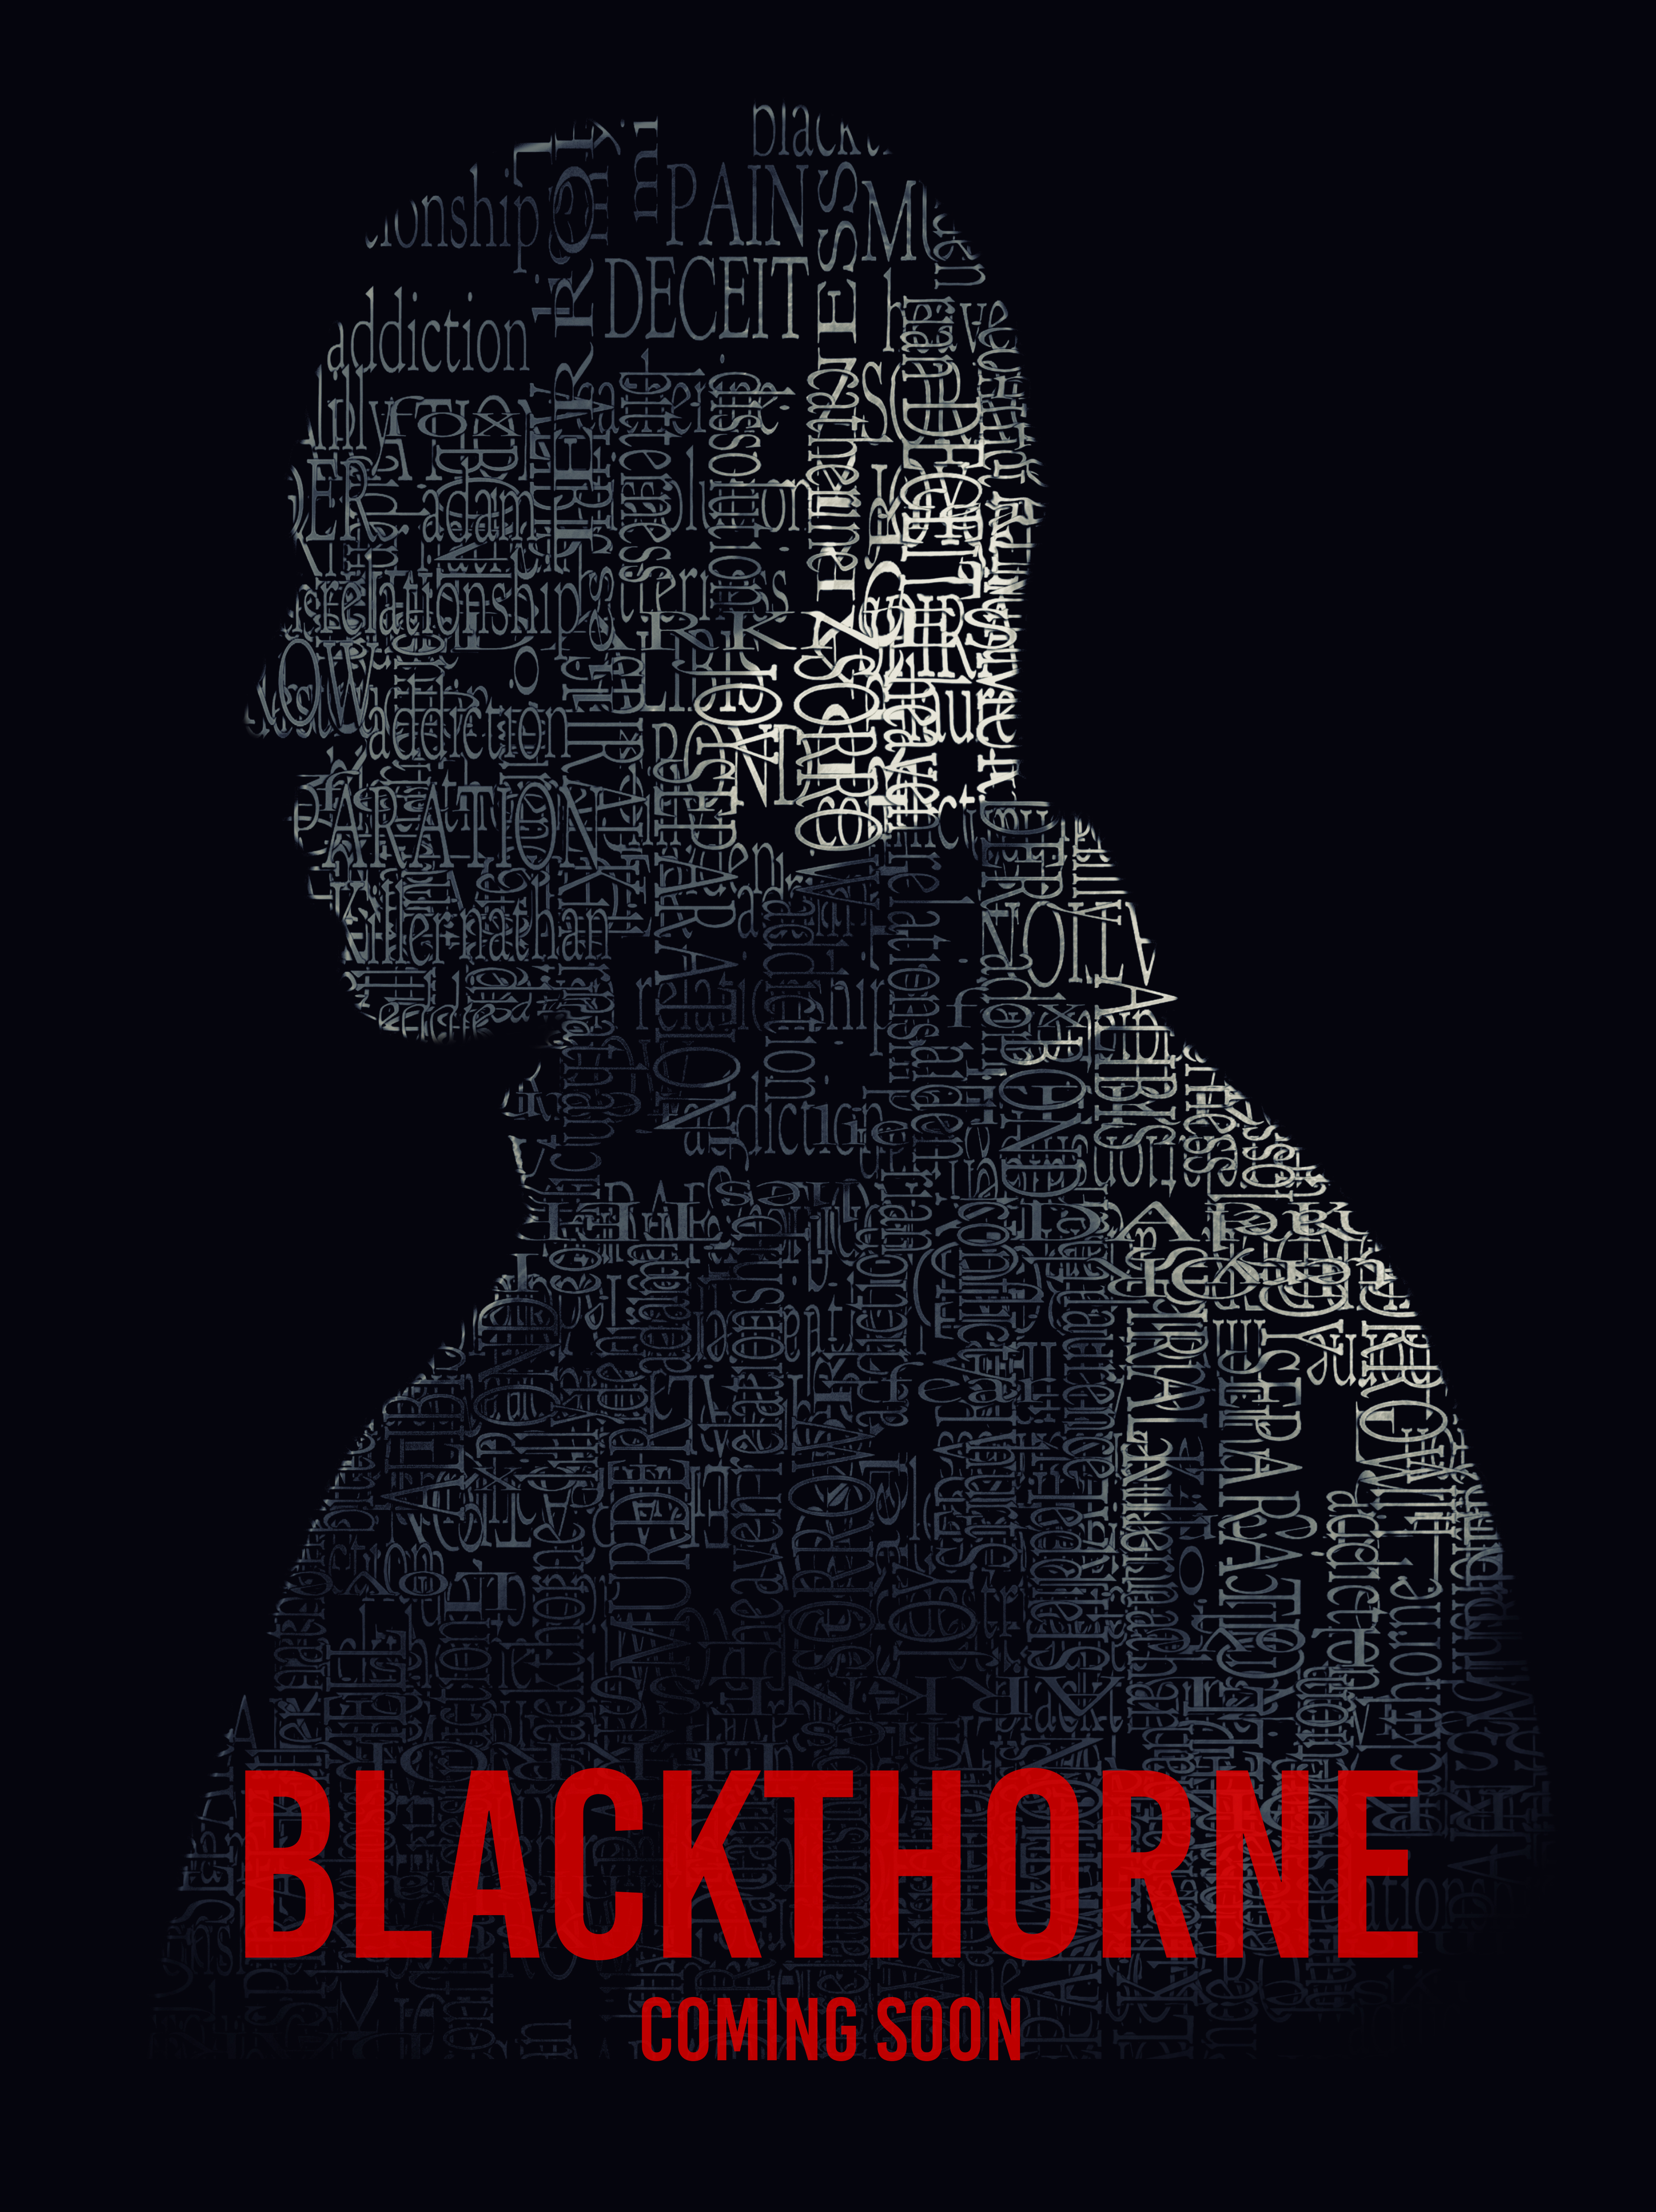 ebay blackthorne